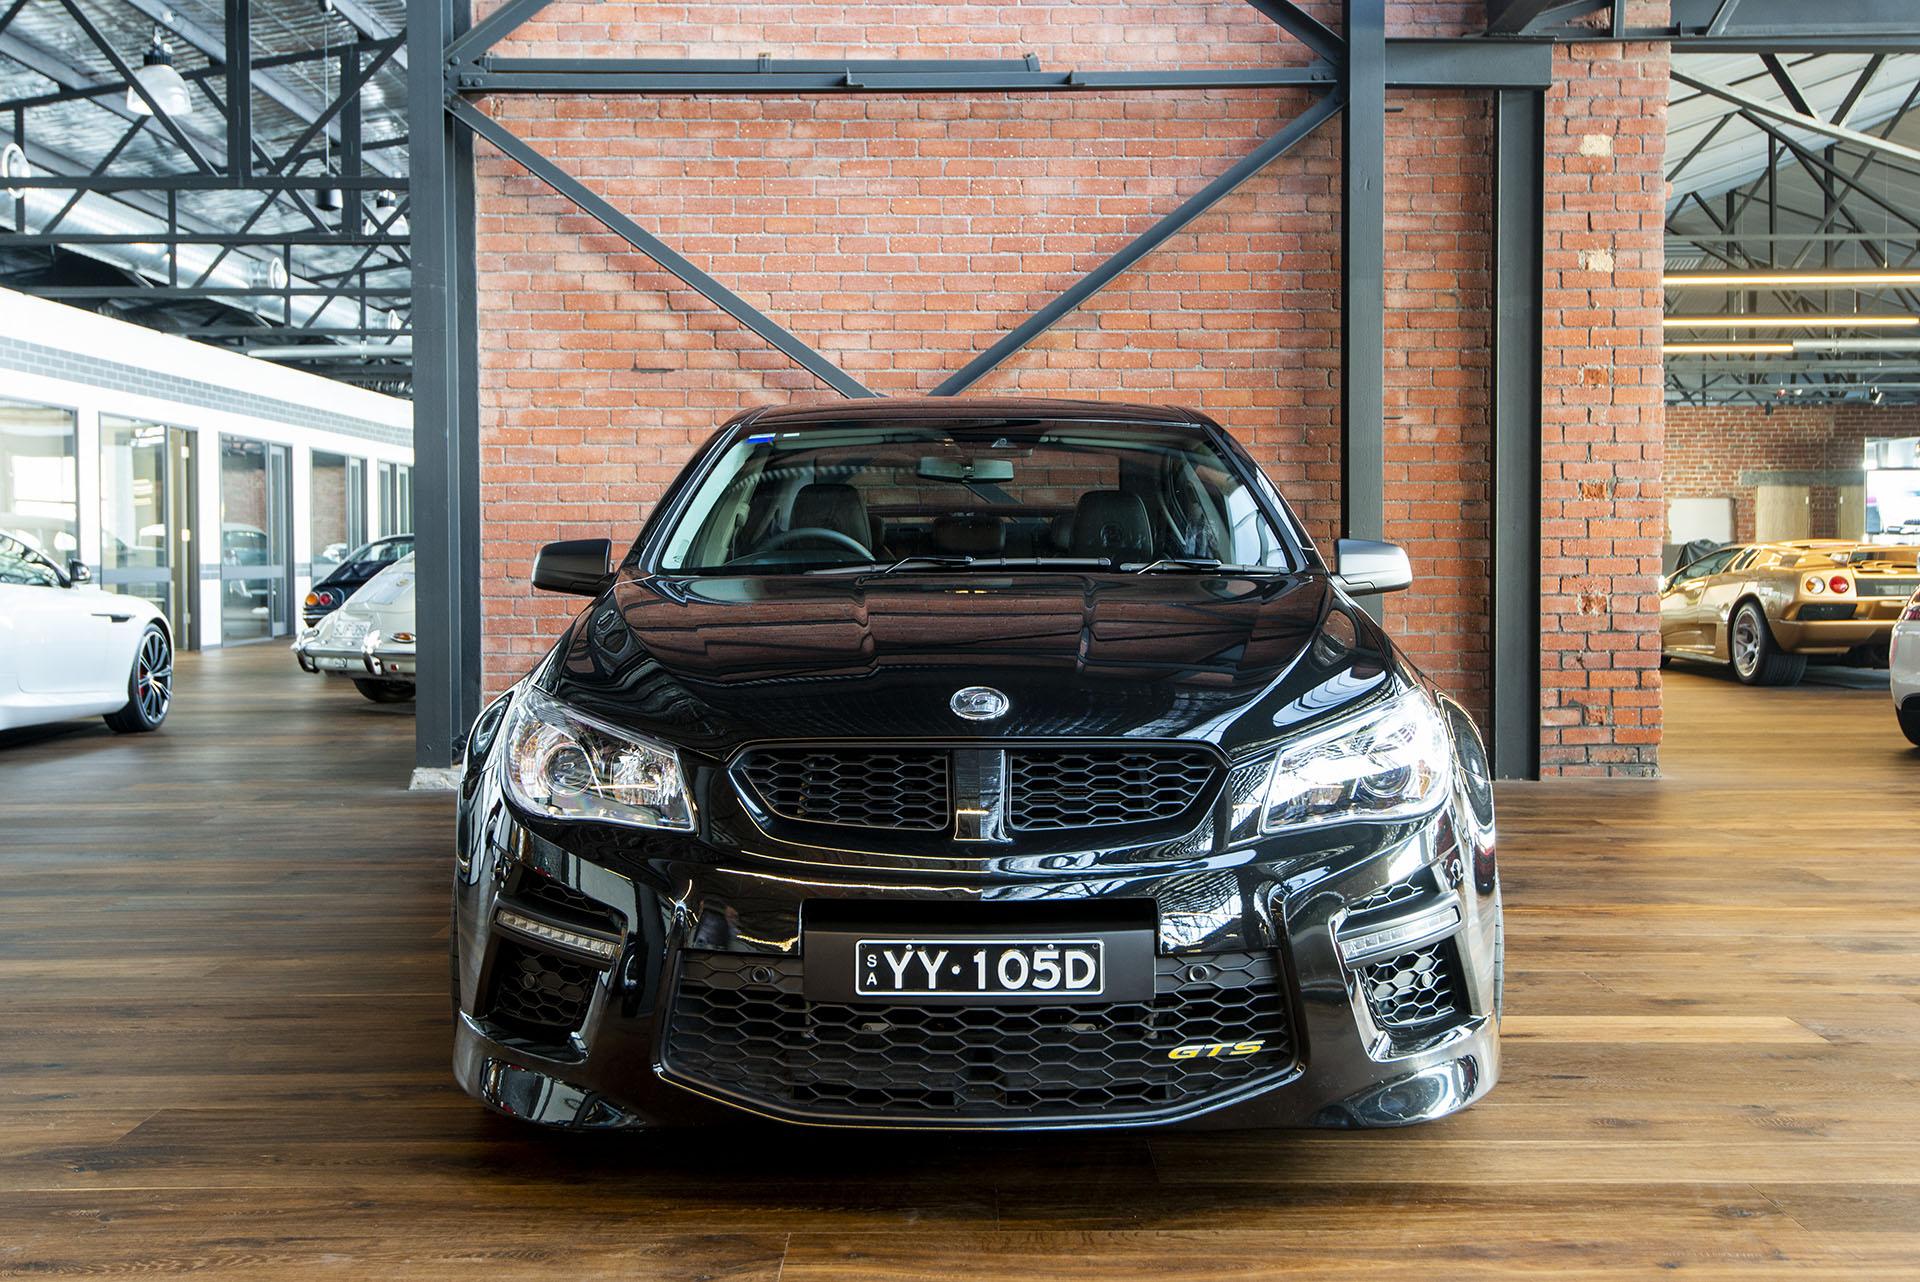 2014 Holden HSV GTS Gen F - Richmonds - Classic and ...